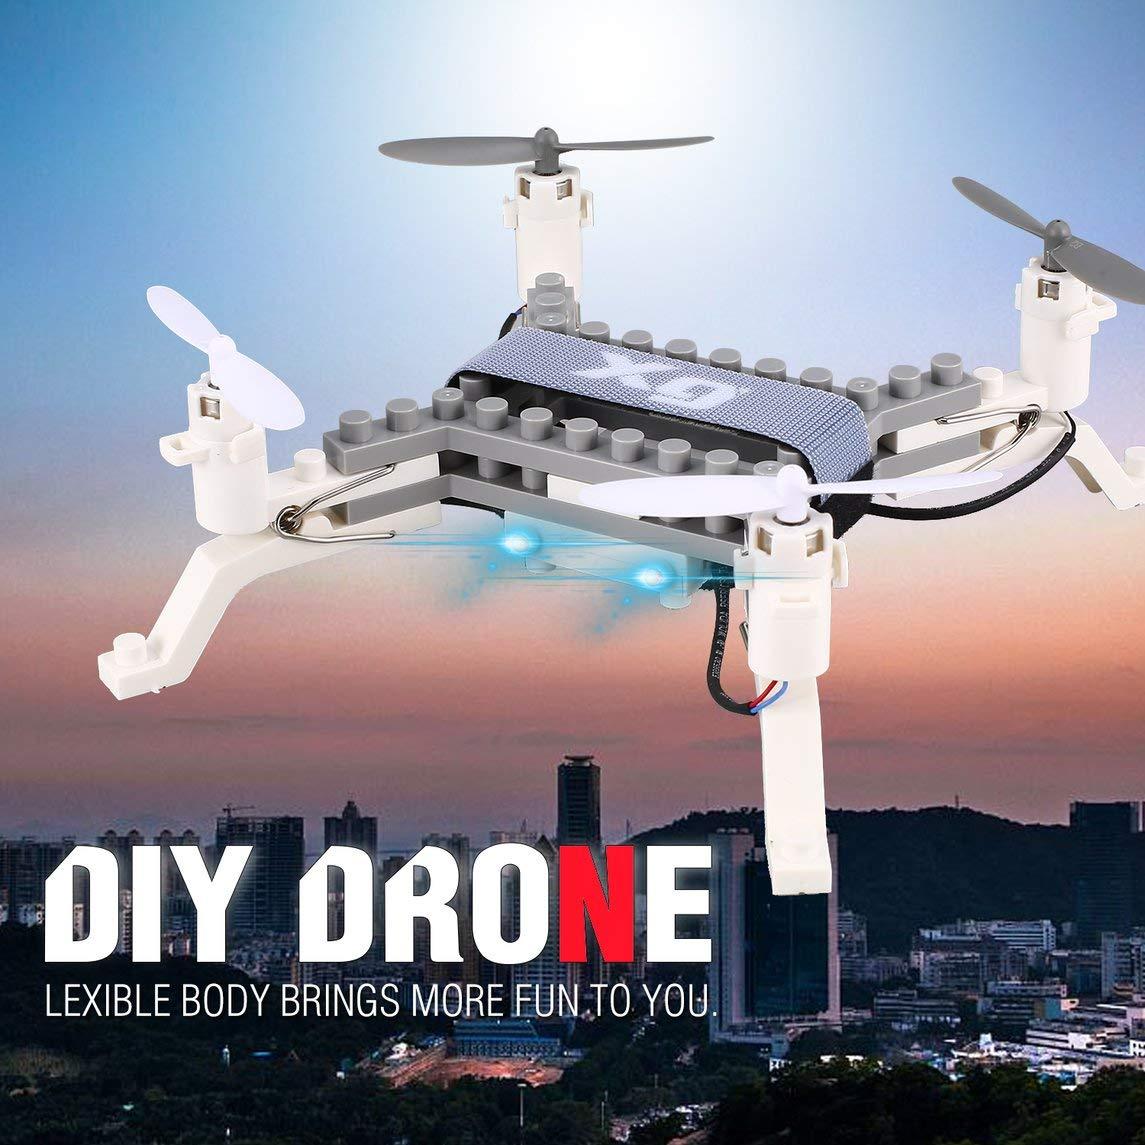 Footprintse dji Phantom 4 Quadcopter;Mini Quadcopter XG171 2.4G RC Bloque DIY DIY Ladrillo Quadcopter Drone con Altitude Hold 3D Flips-Color: Blanco